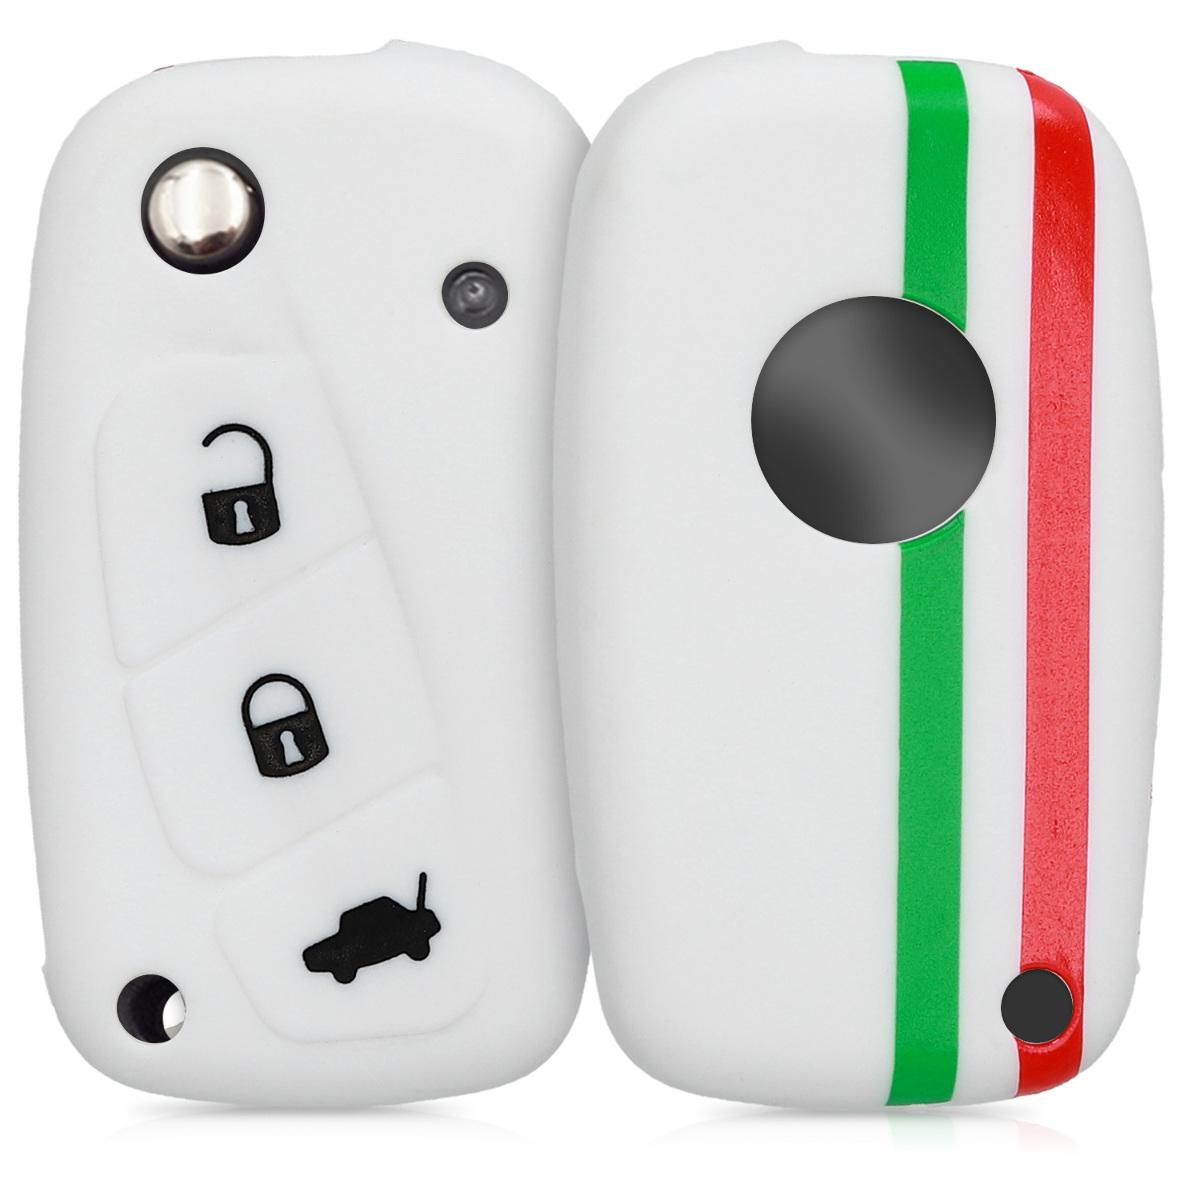 KW Θήκη Κλειδιού Fiat Lancia - Silicone - 3 Κουμπιά - Green / Red / White (46918.02)